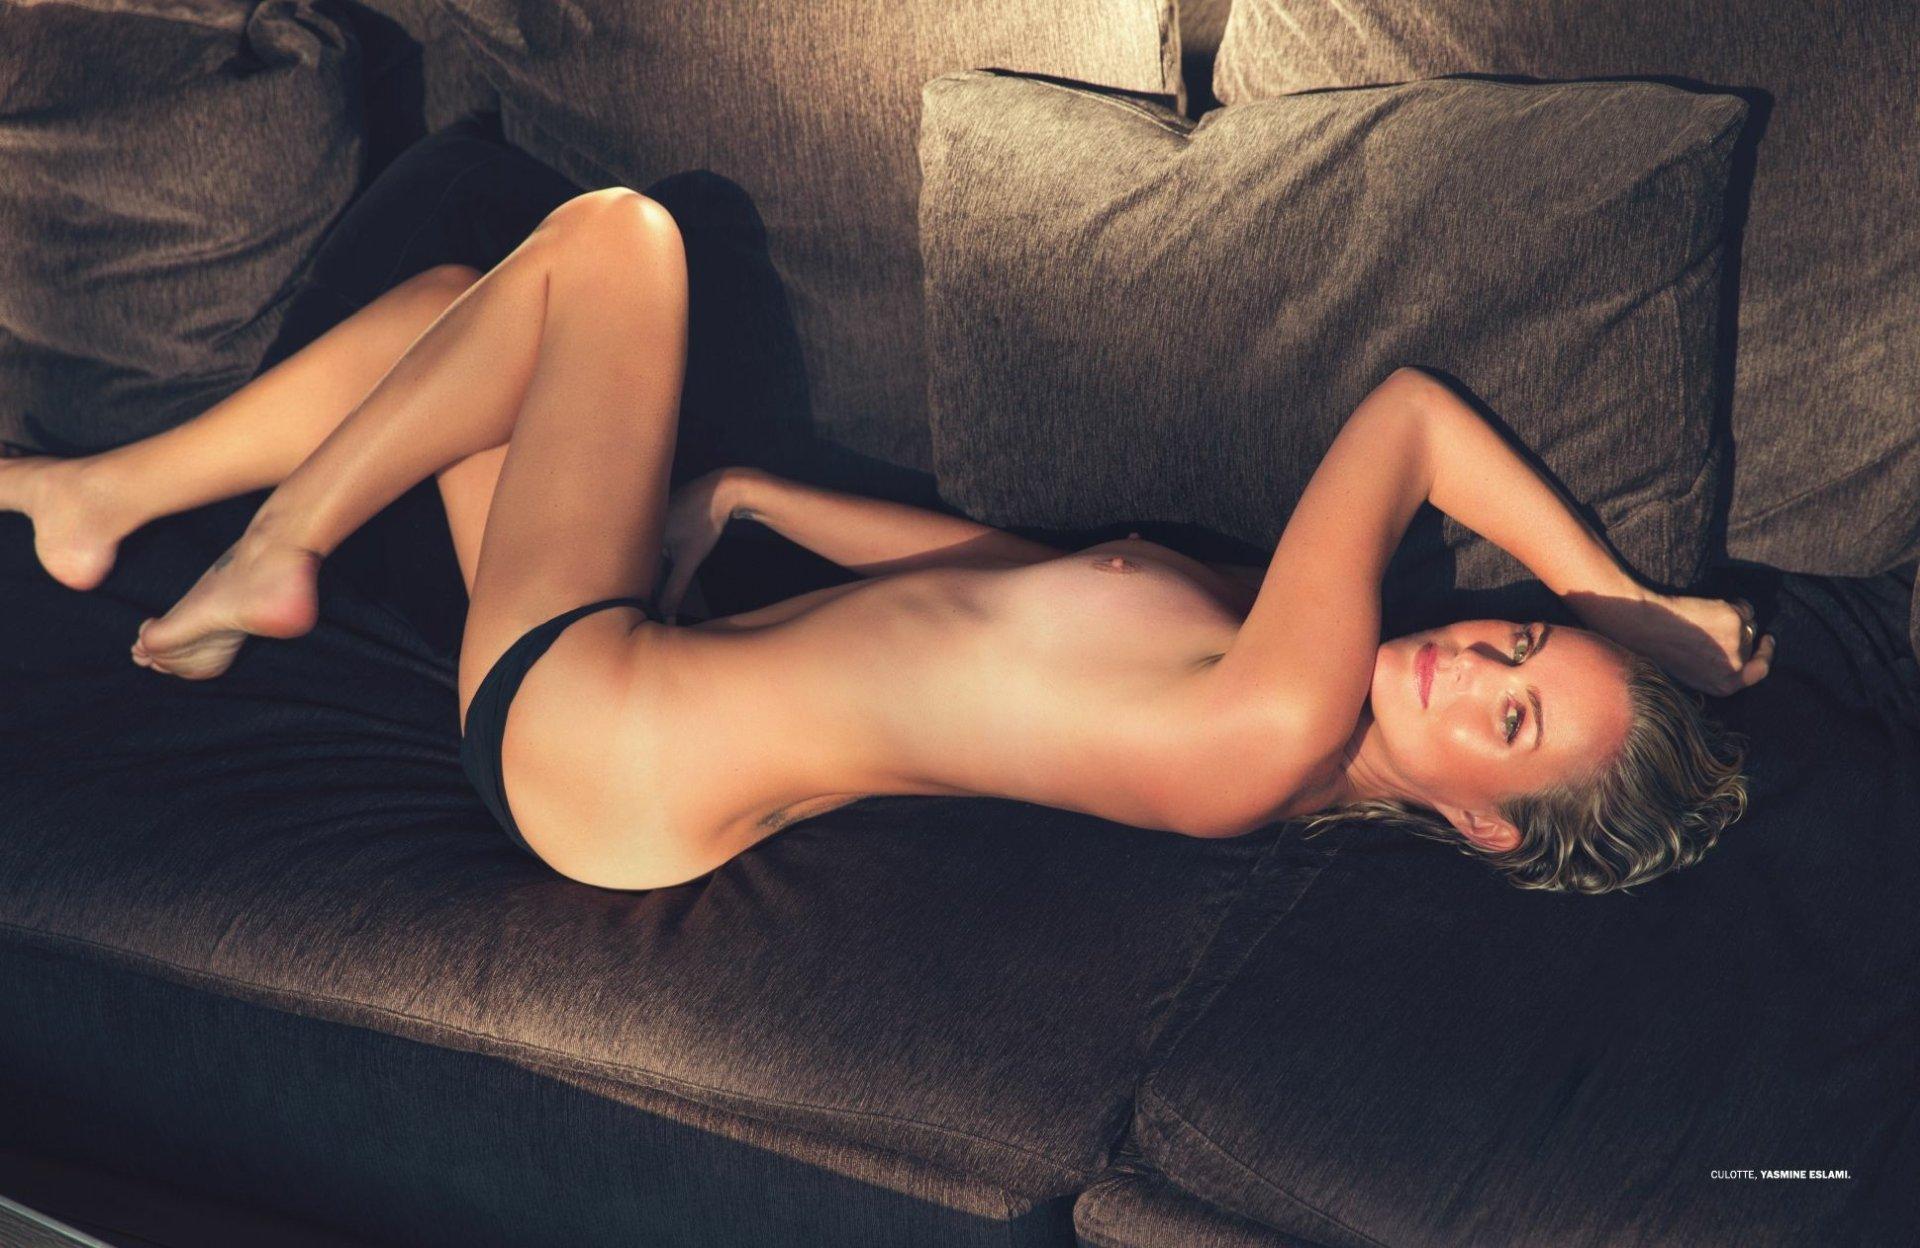 nudes (98 photos), Tits Celebrity photos